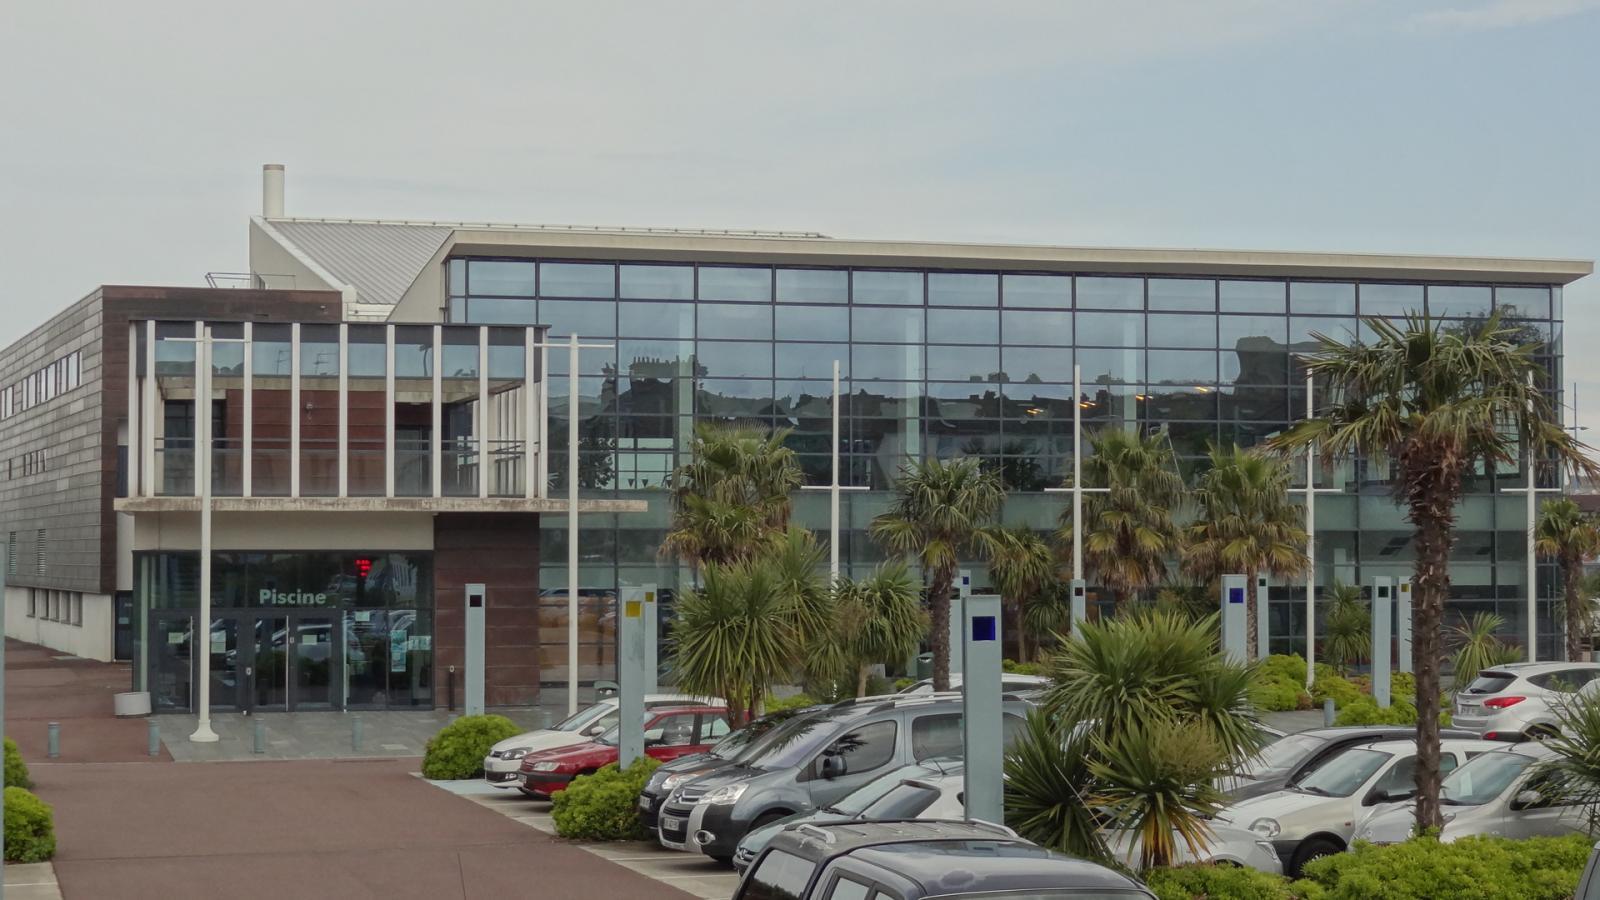 Piscine Chantereyne : Piscine Cherbourg En Cotentin 50100 ... concernant Piscine Cherbourg